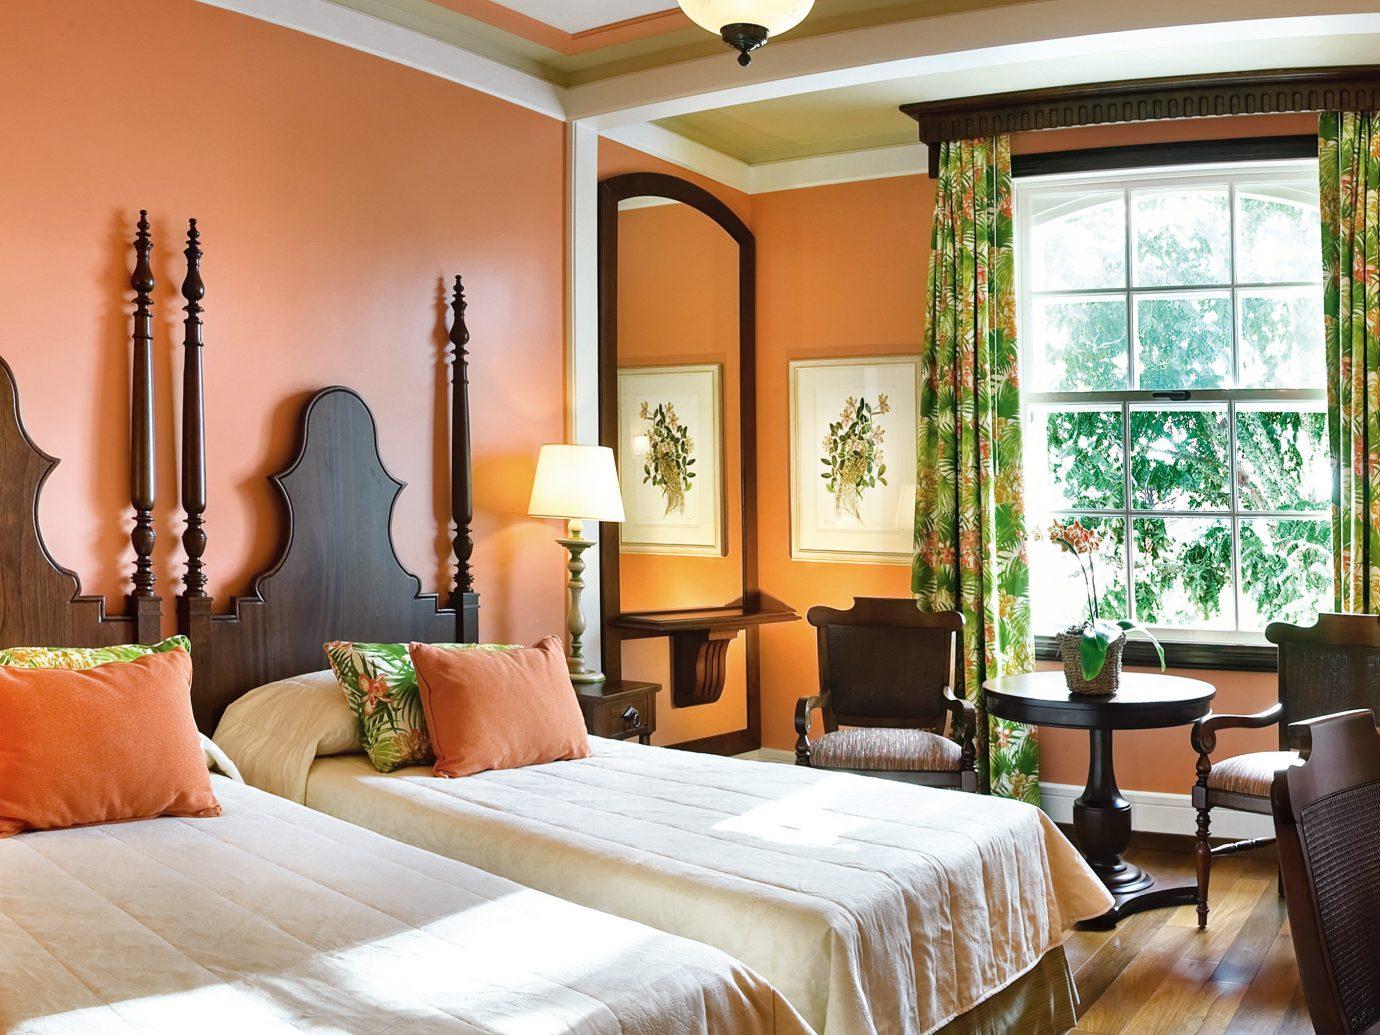 Bedroom at Belmond Hotel das Cataratas